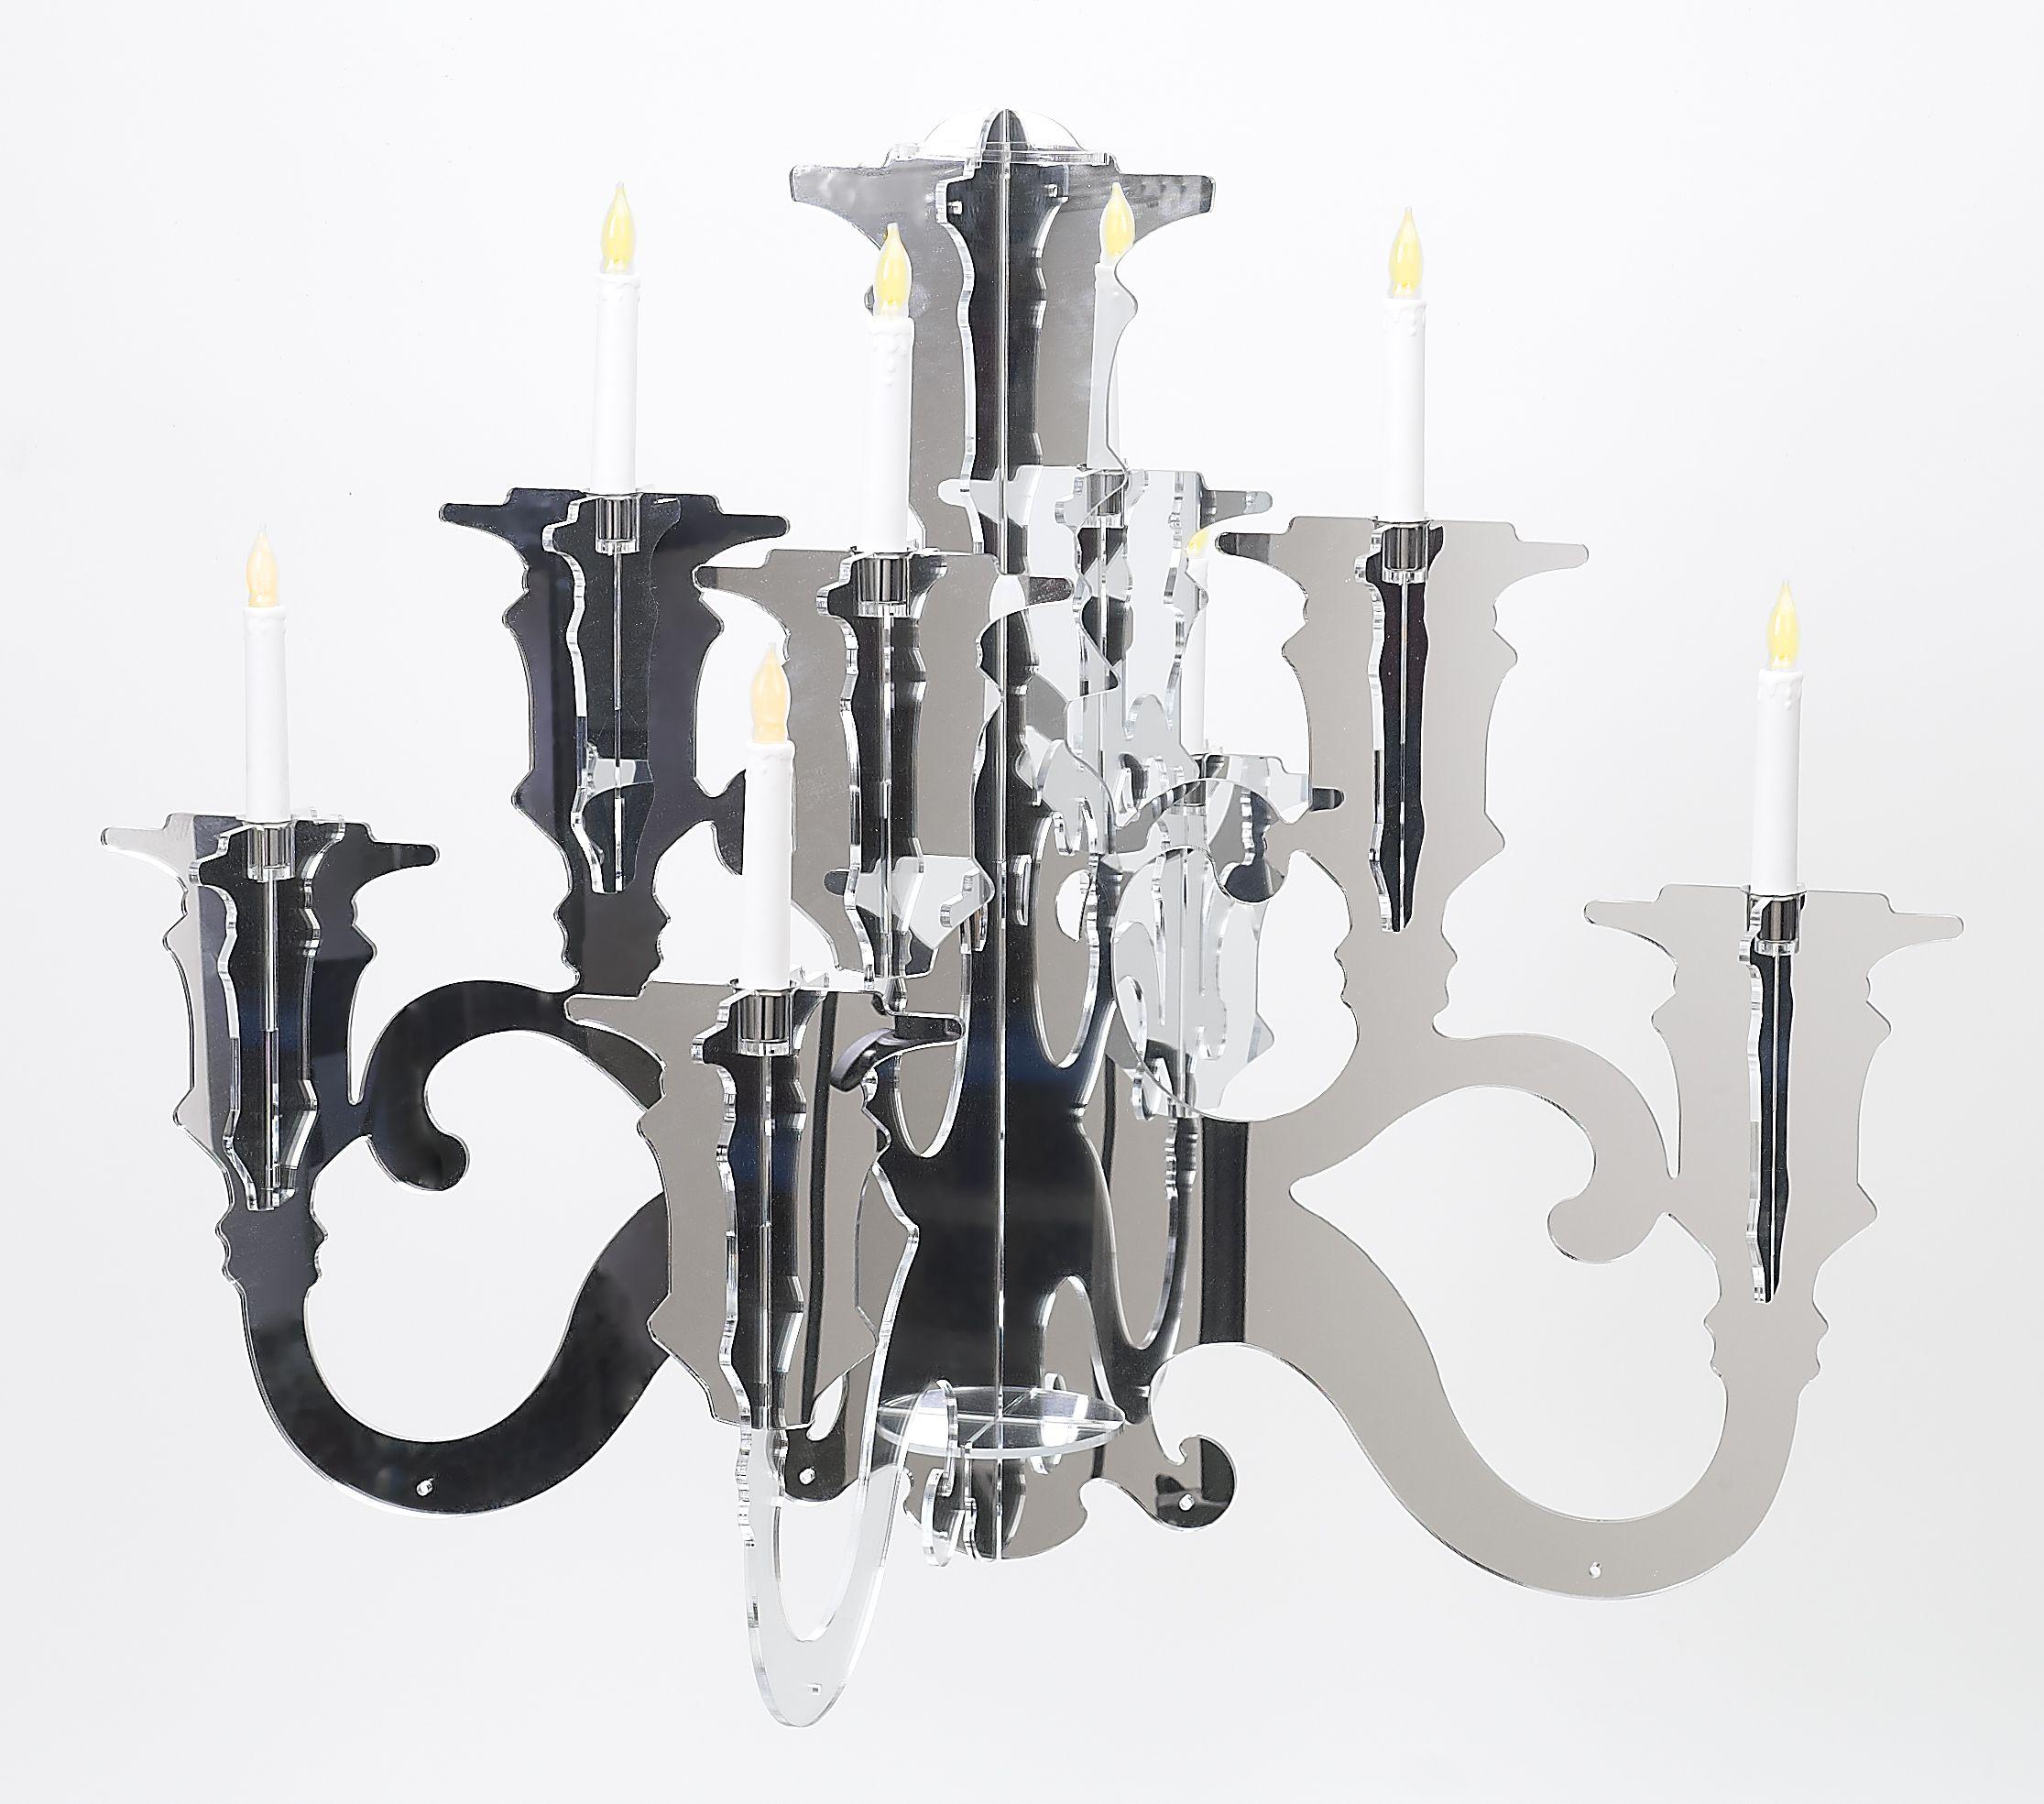 Baroque Acrylic Chandelier LIG38. All Acrylic Baroque Silhouette ...